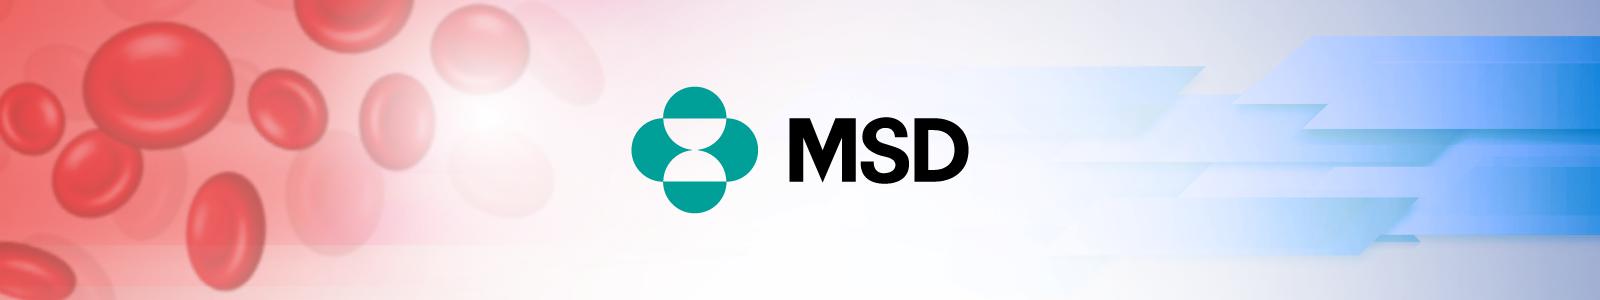 Diacordis2021-BANNER-MSD